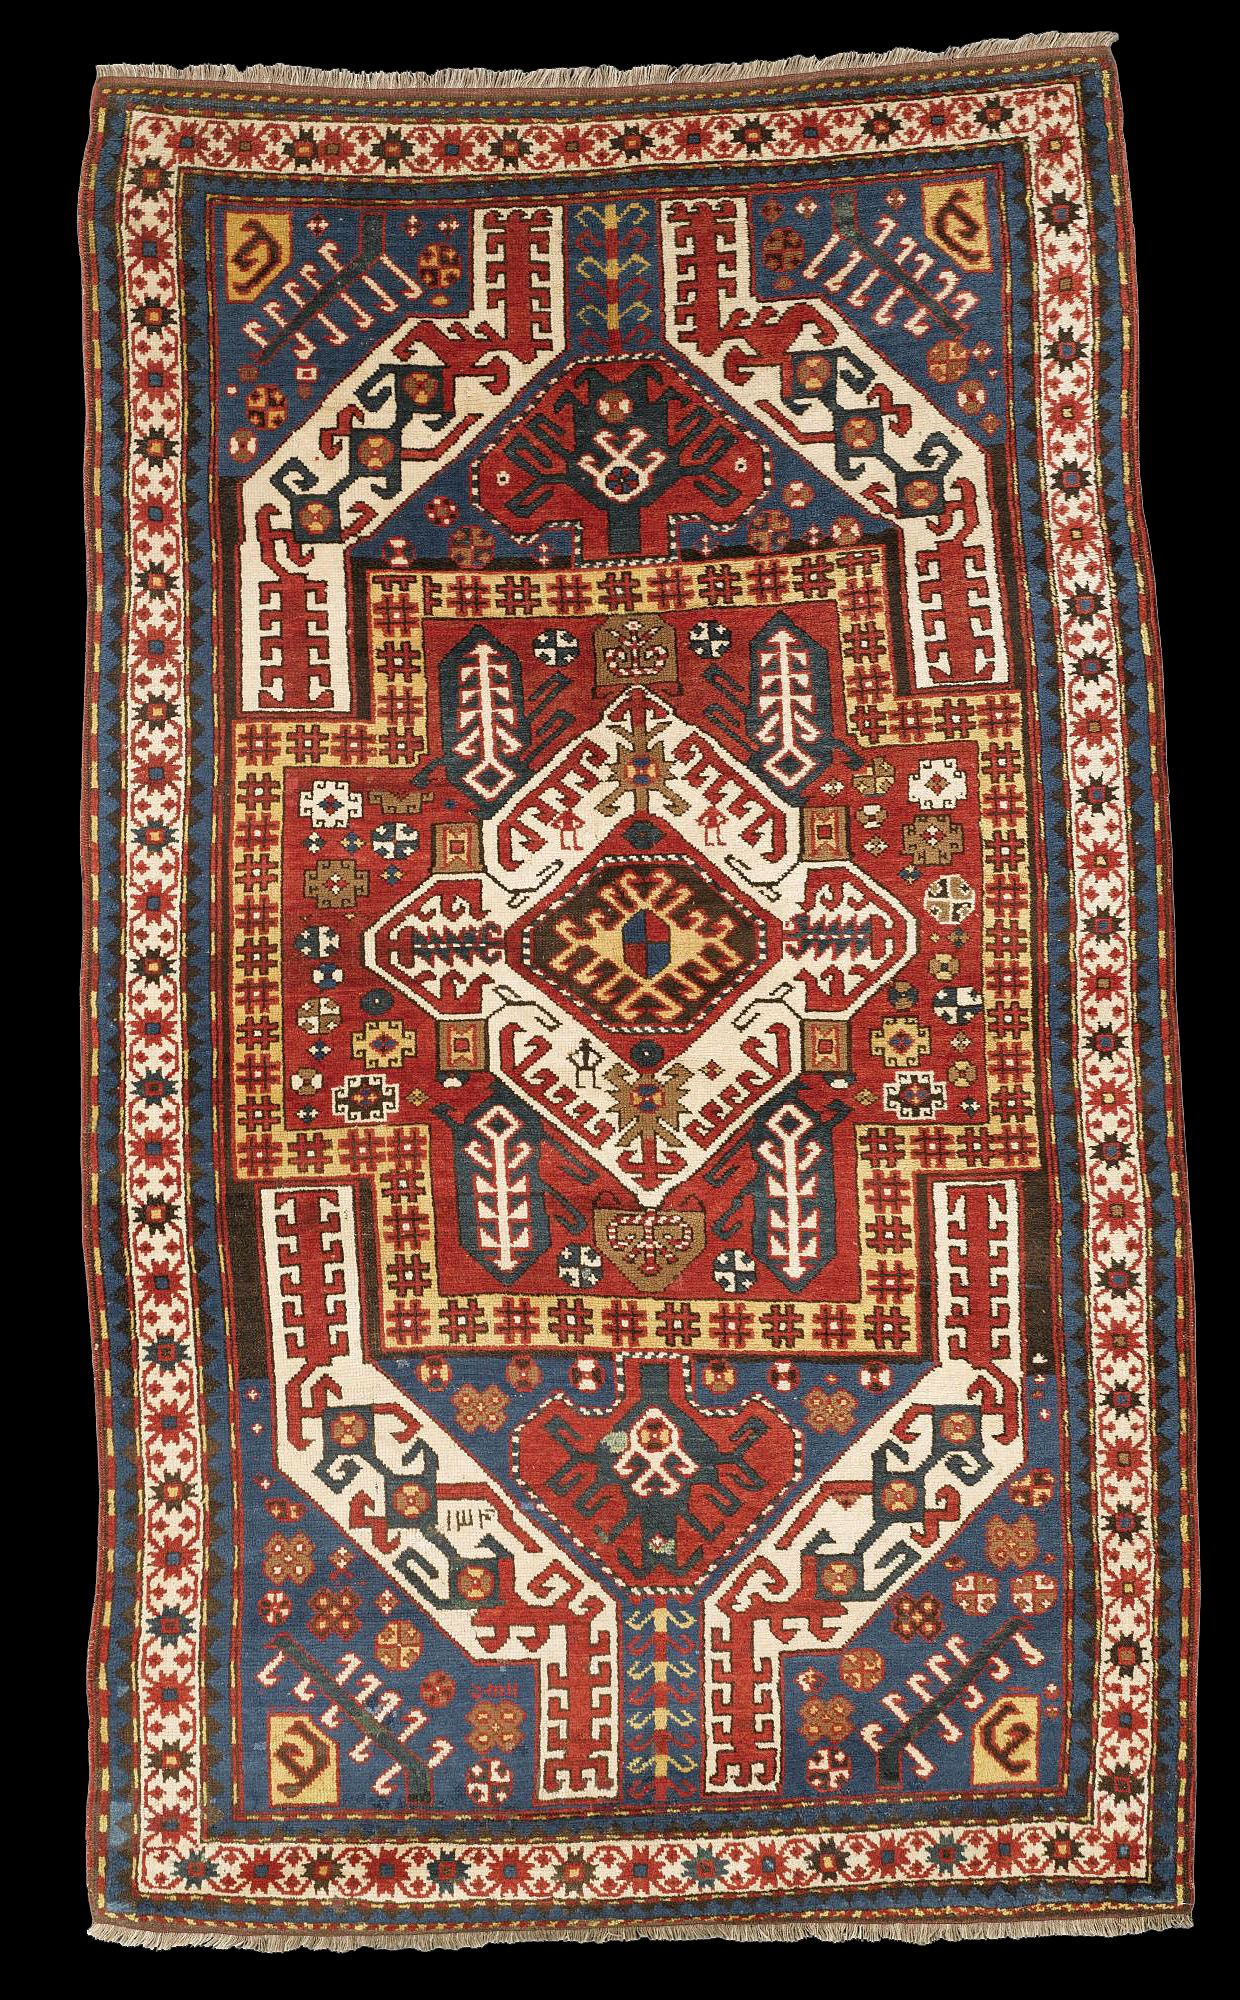 "Antique Karabagh ""Kasim Ushag"" rug, AH 1340 dated (1921 AD), Elisabethpol Governorate (Елизаветпольская губерния), Zangezur Uyezd, Kasim Ushak Oba"